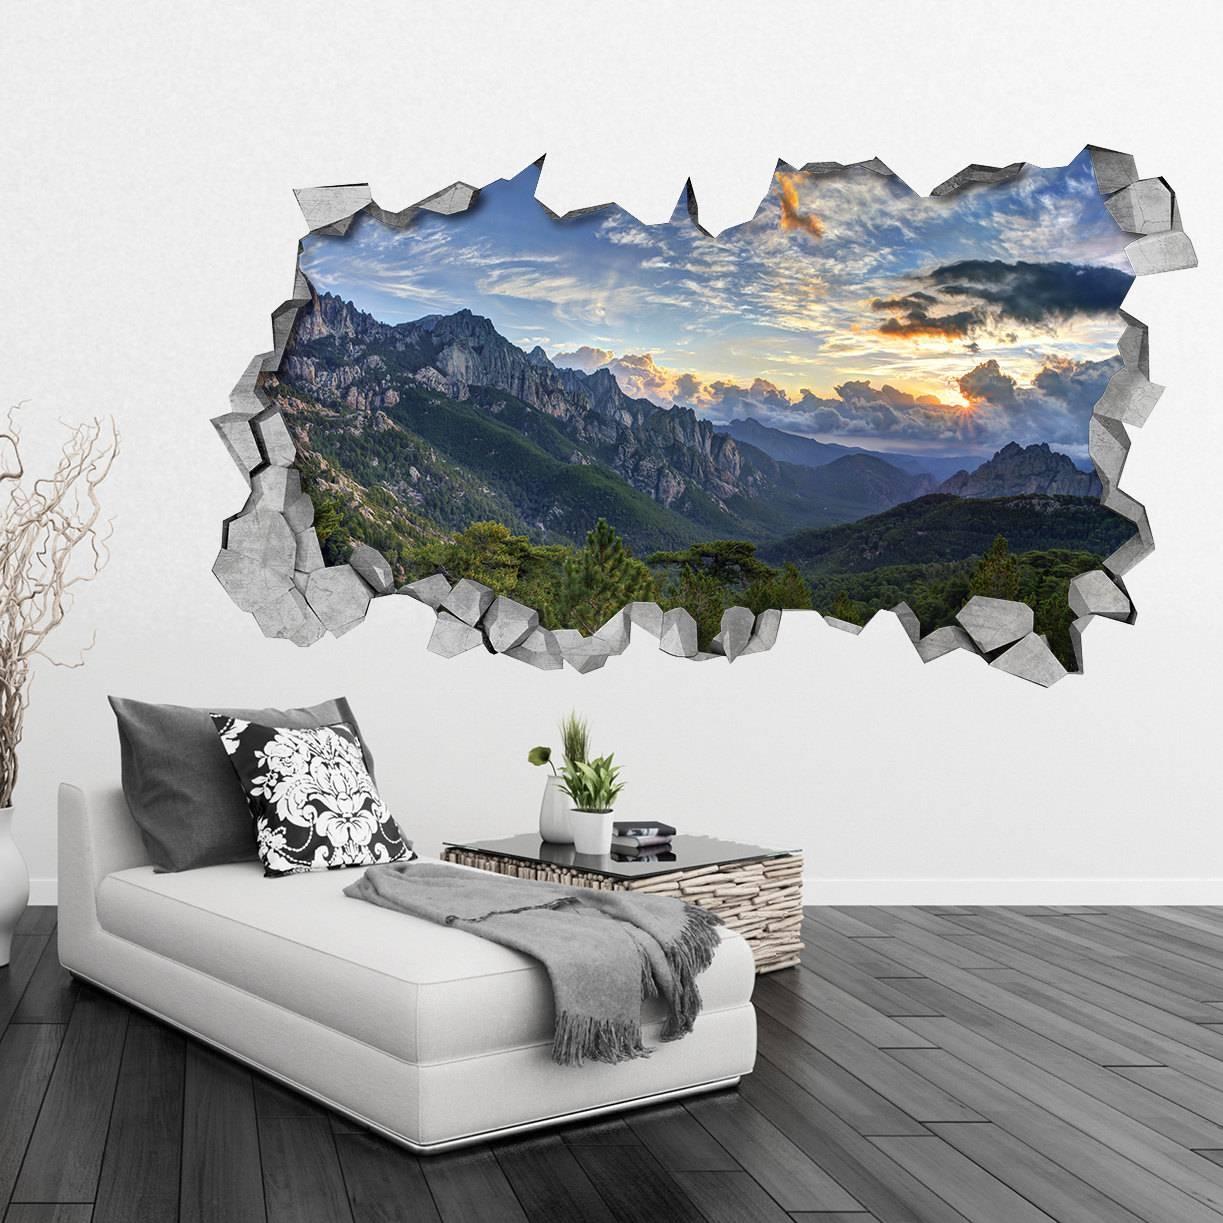 Mountains 3d Wallpaper Broken Wall Decal Wall Sticker Intended For Best And Newest Venezuela Wall Art 3d (View 16 of 20)